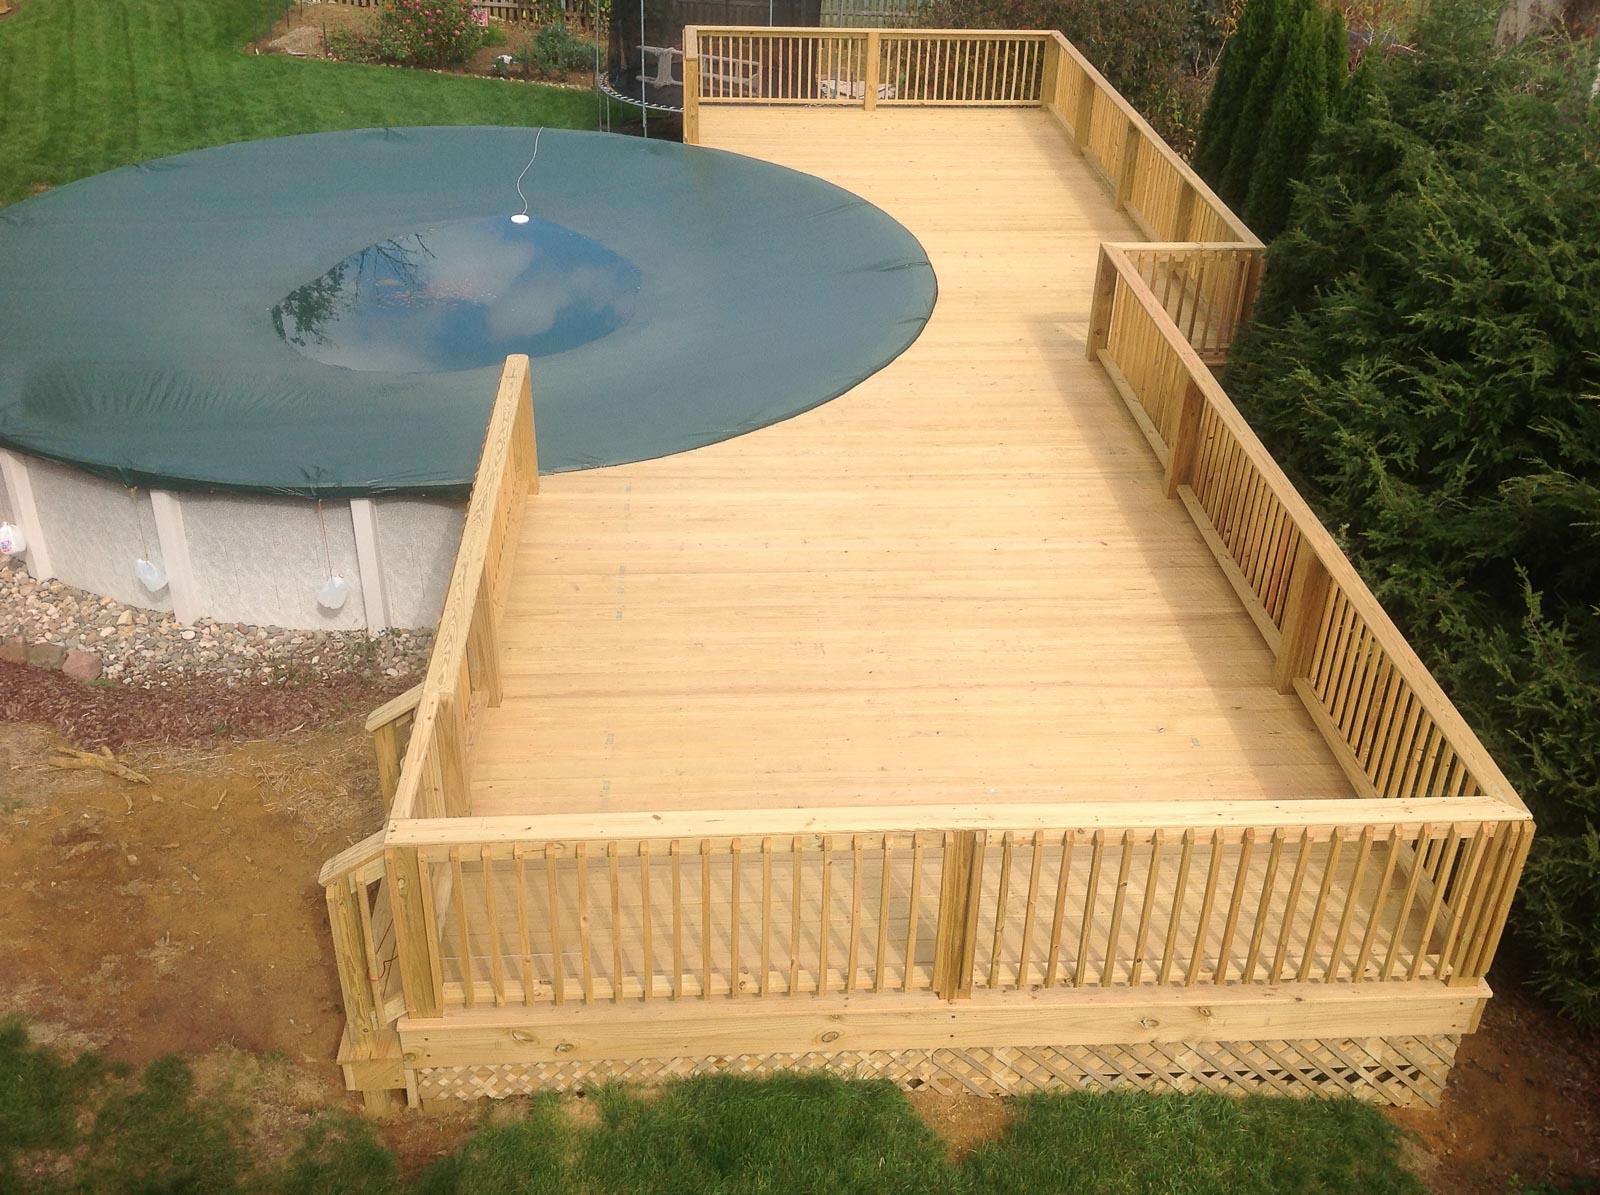 Pool Deck By Leids Carpentry 2 Leid S Carpentry